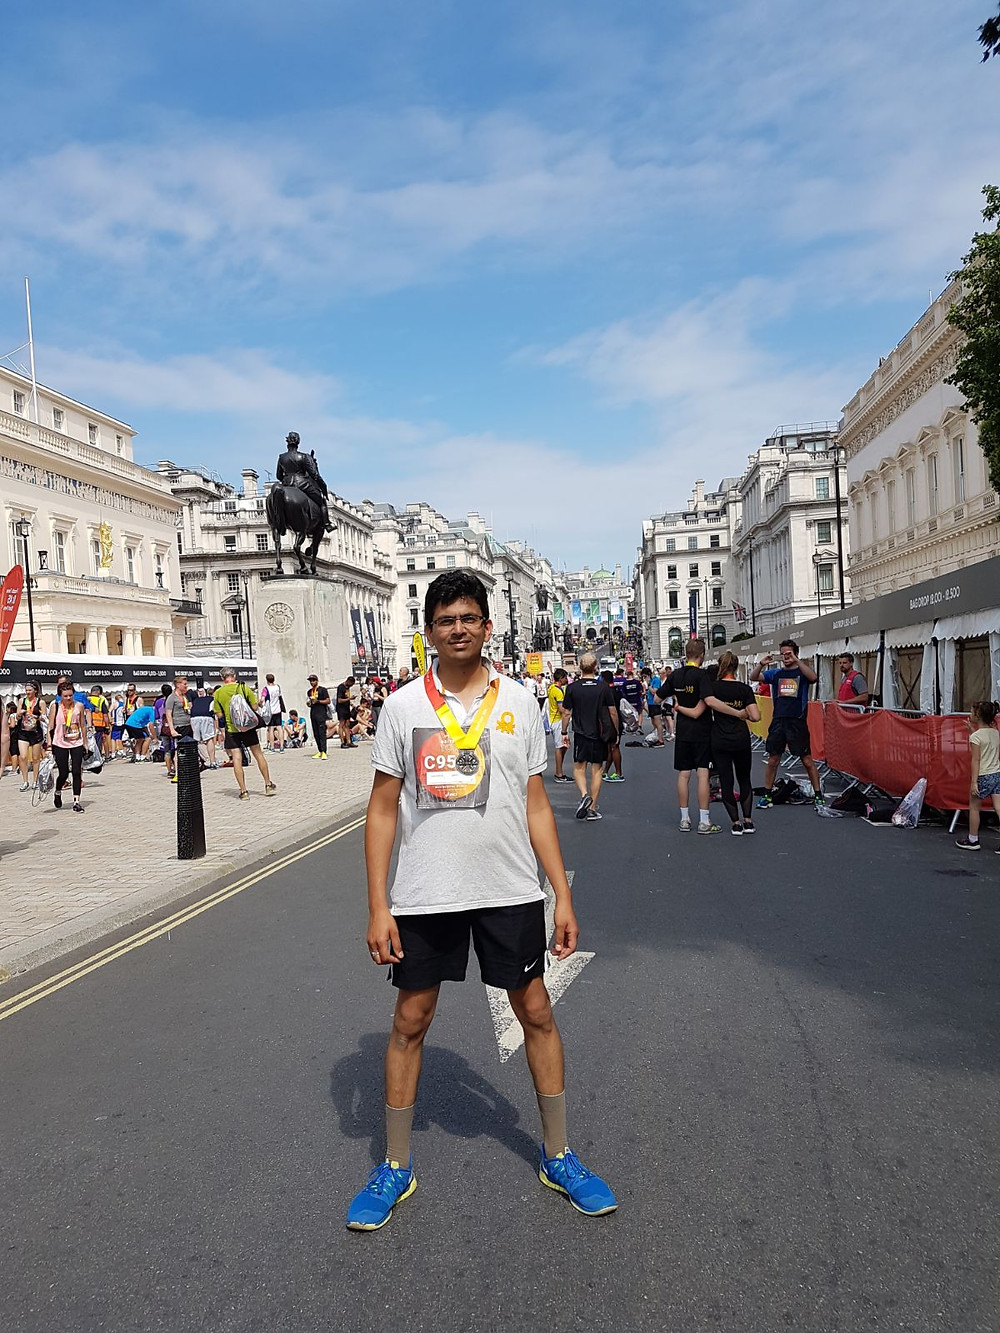 Dr Shashank Sharma - After finishing British 10k